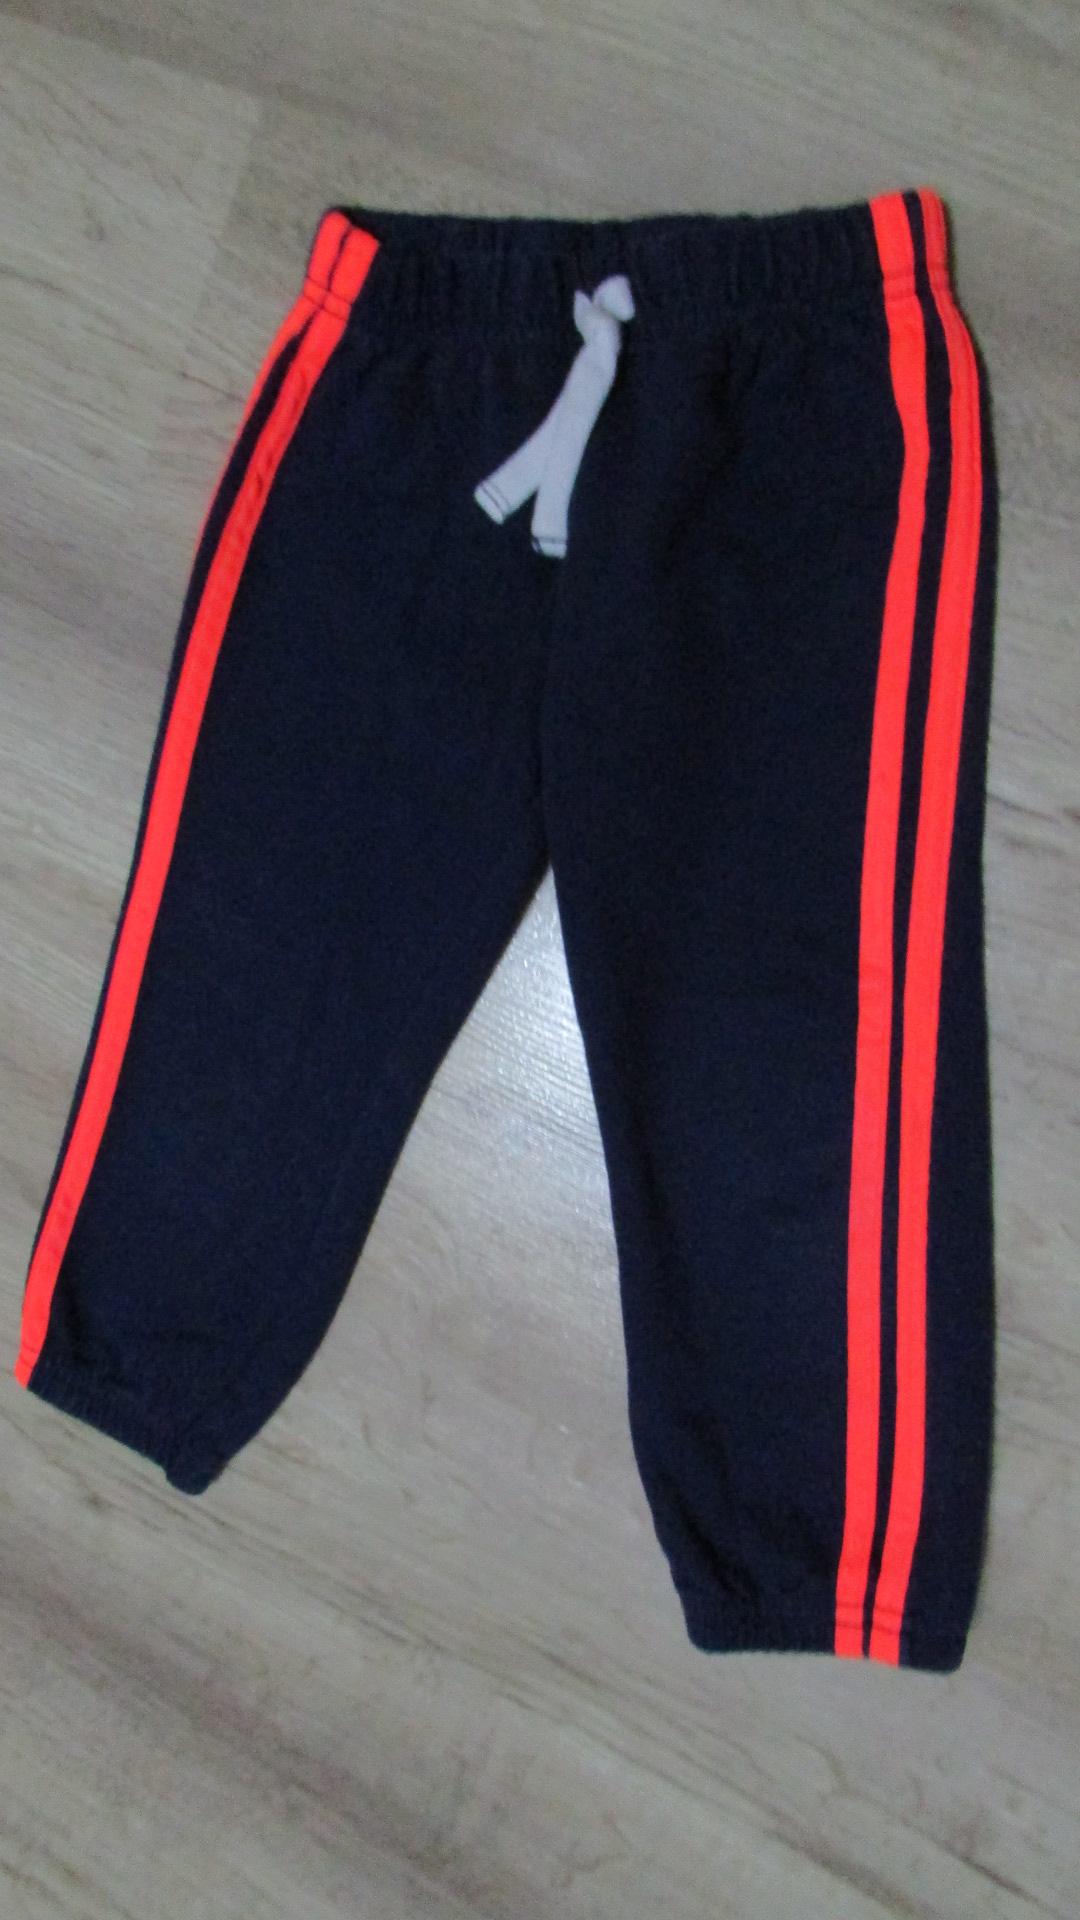 CARTER'S spodnie DRESOWE GRANATOWE na 2 LATA *92*